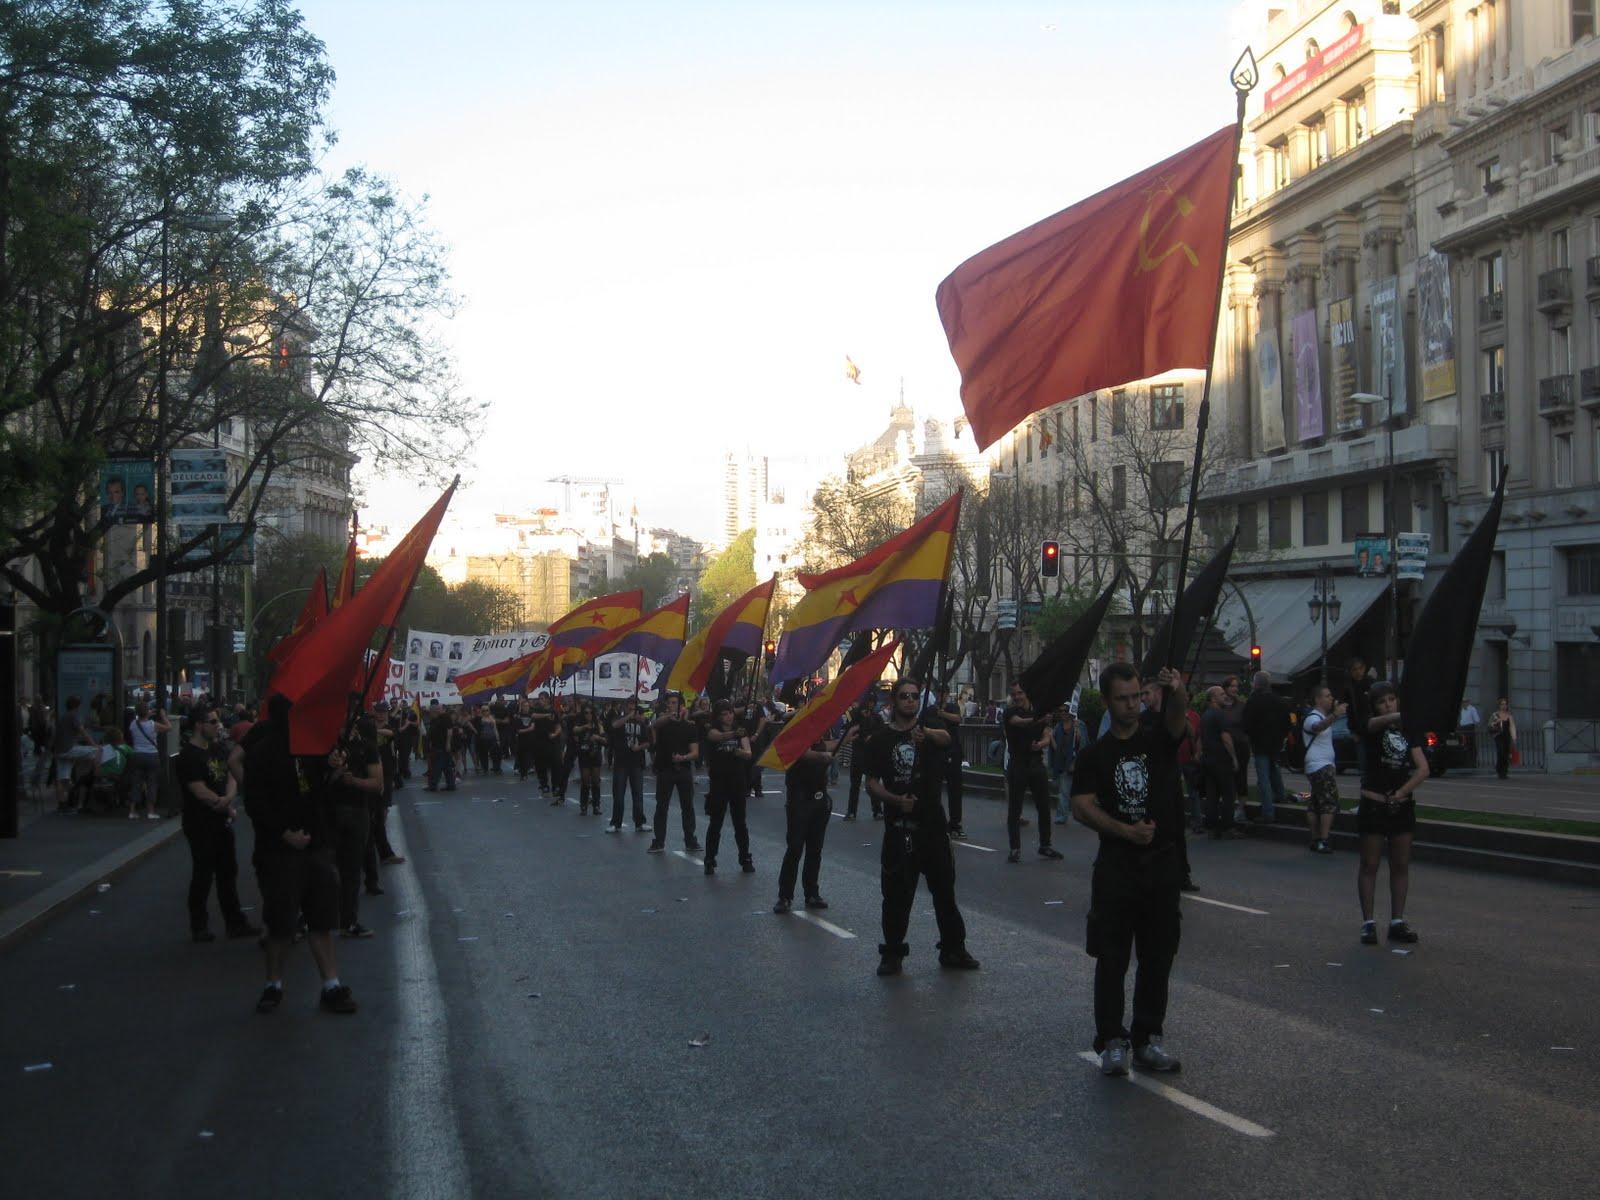 Reconstrucción Comunista ¿qué os parecen? 7